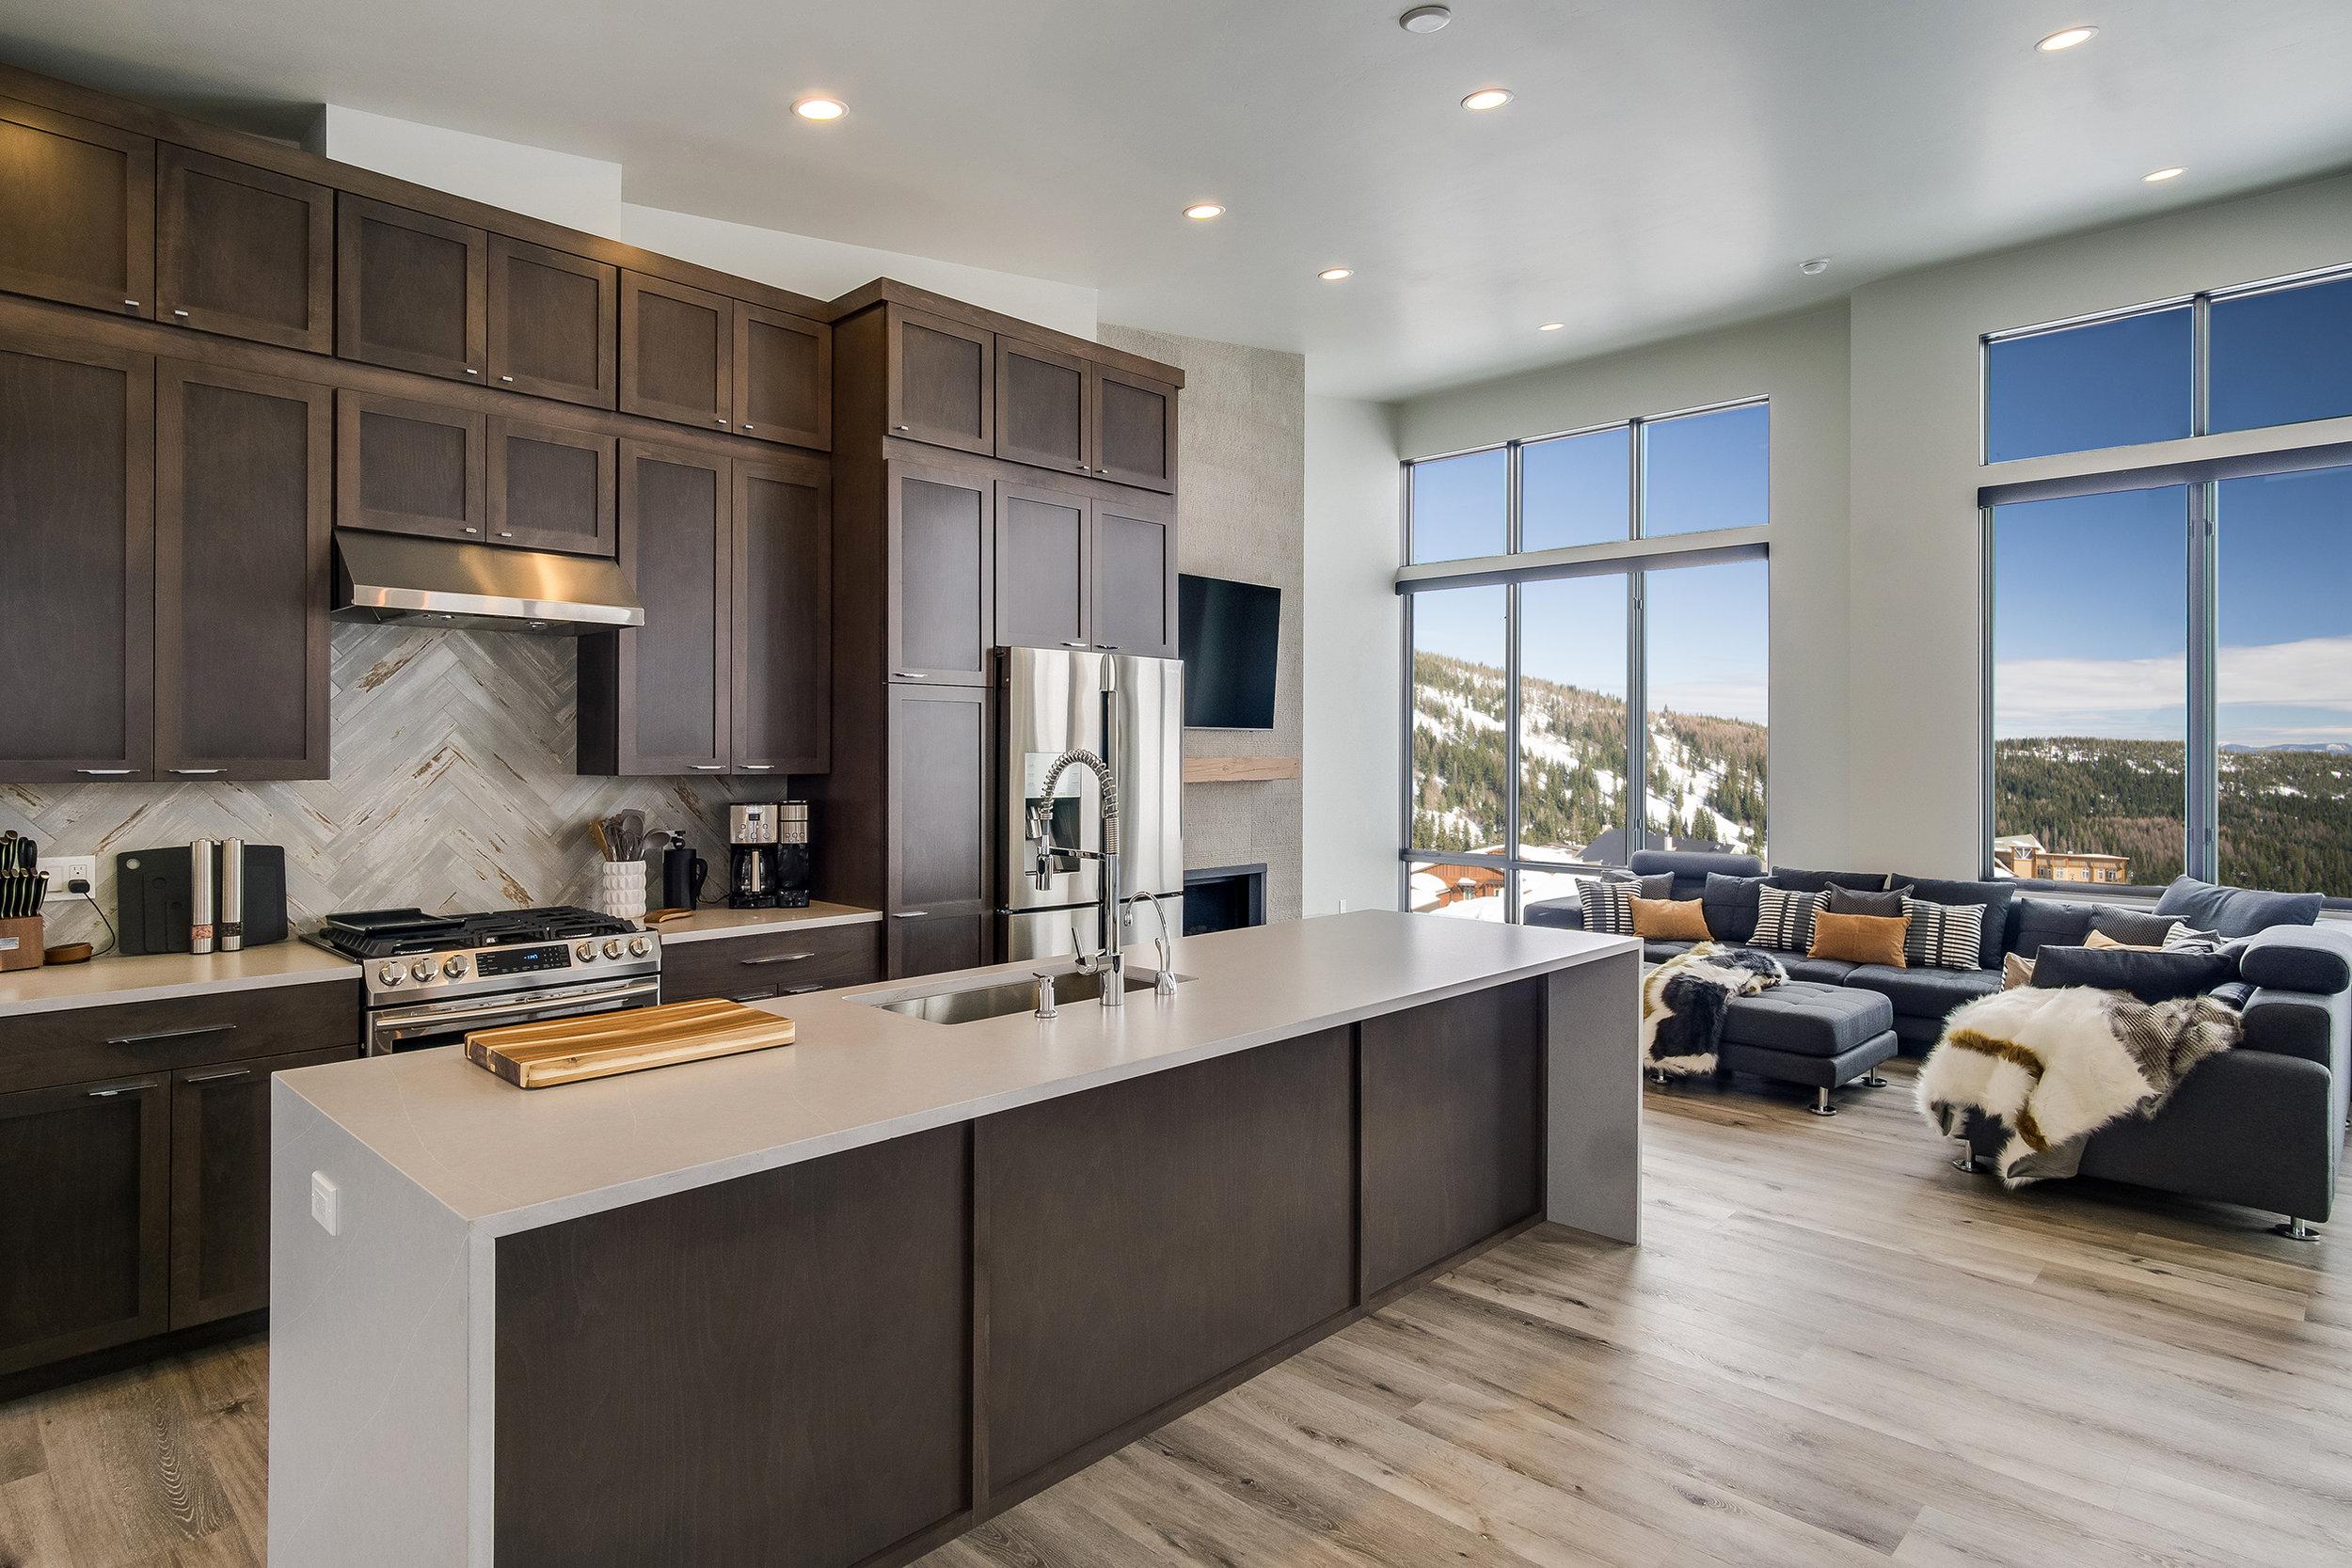 Headwall-Interiors-Windows-View-Mountain-Kitchen.jpg